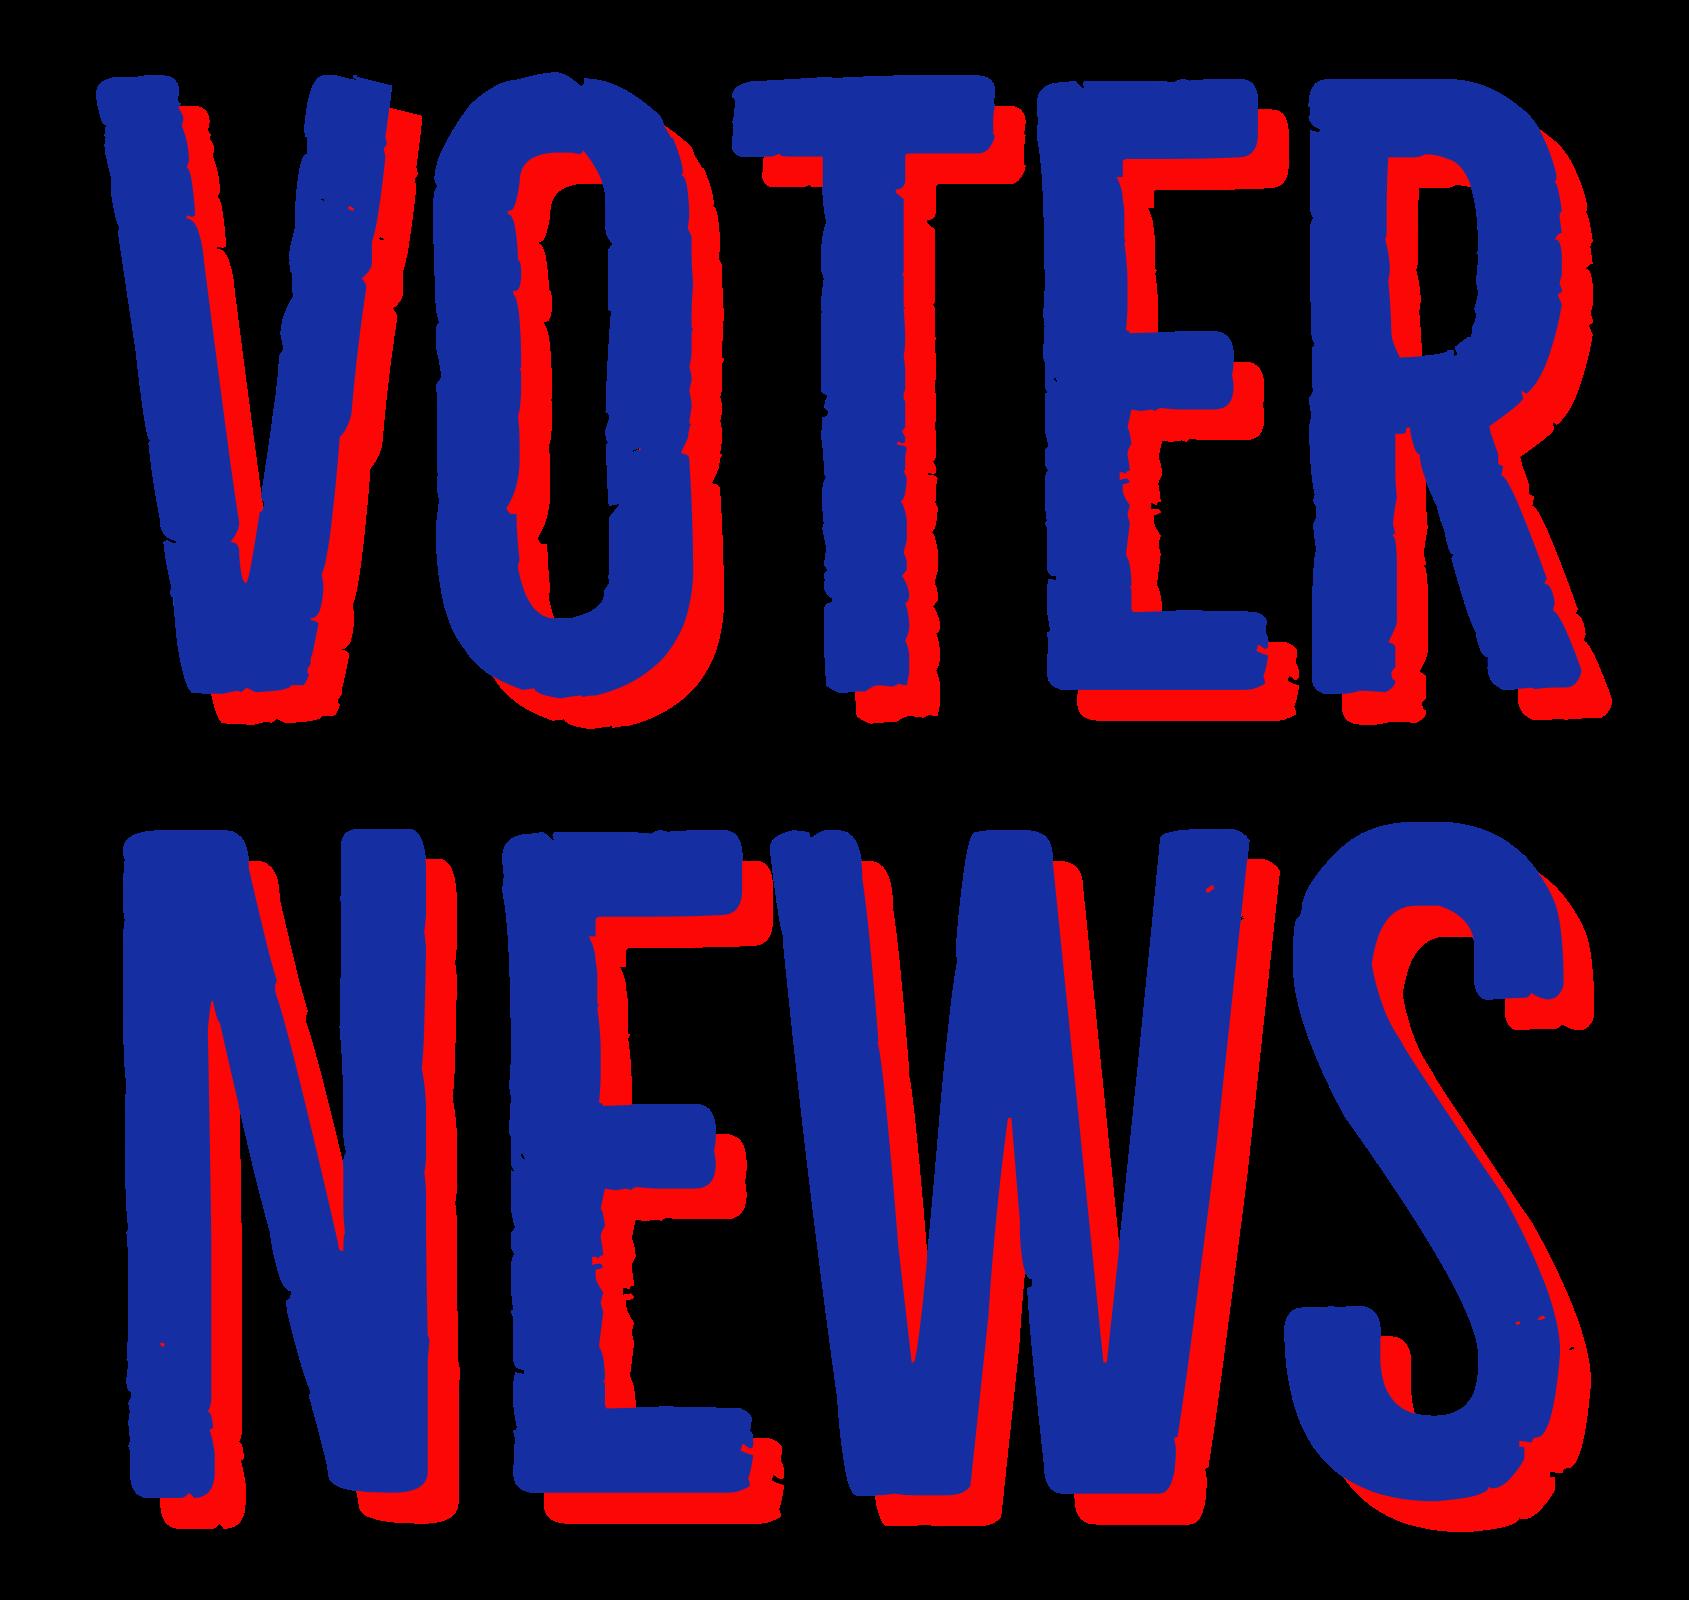 Voter News